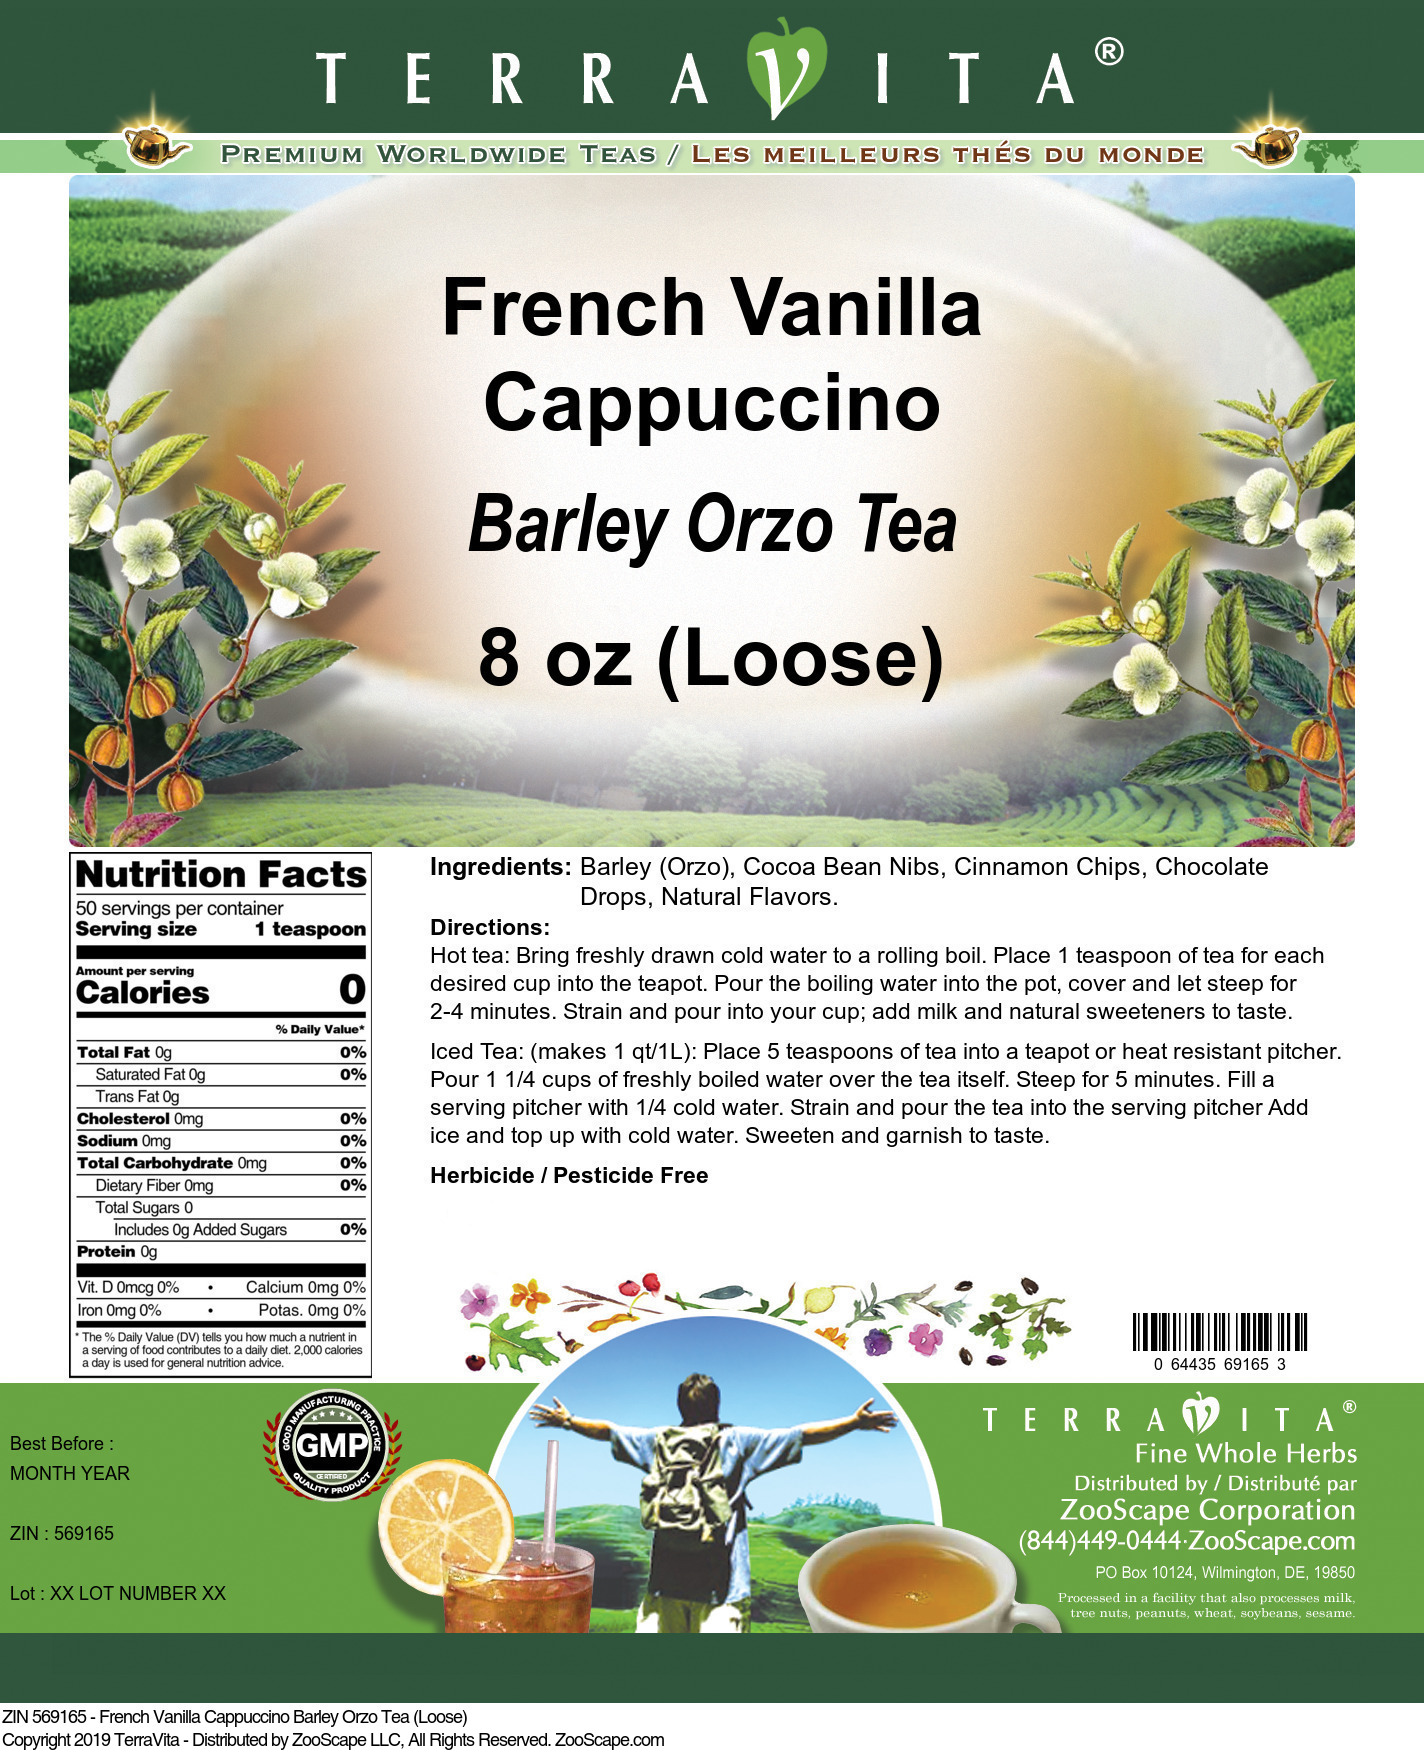 French Vanilla Cappuccino Barley Orzo Tea (Loose)